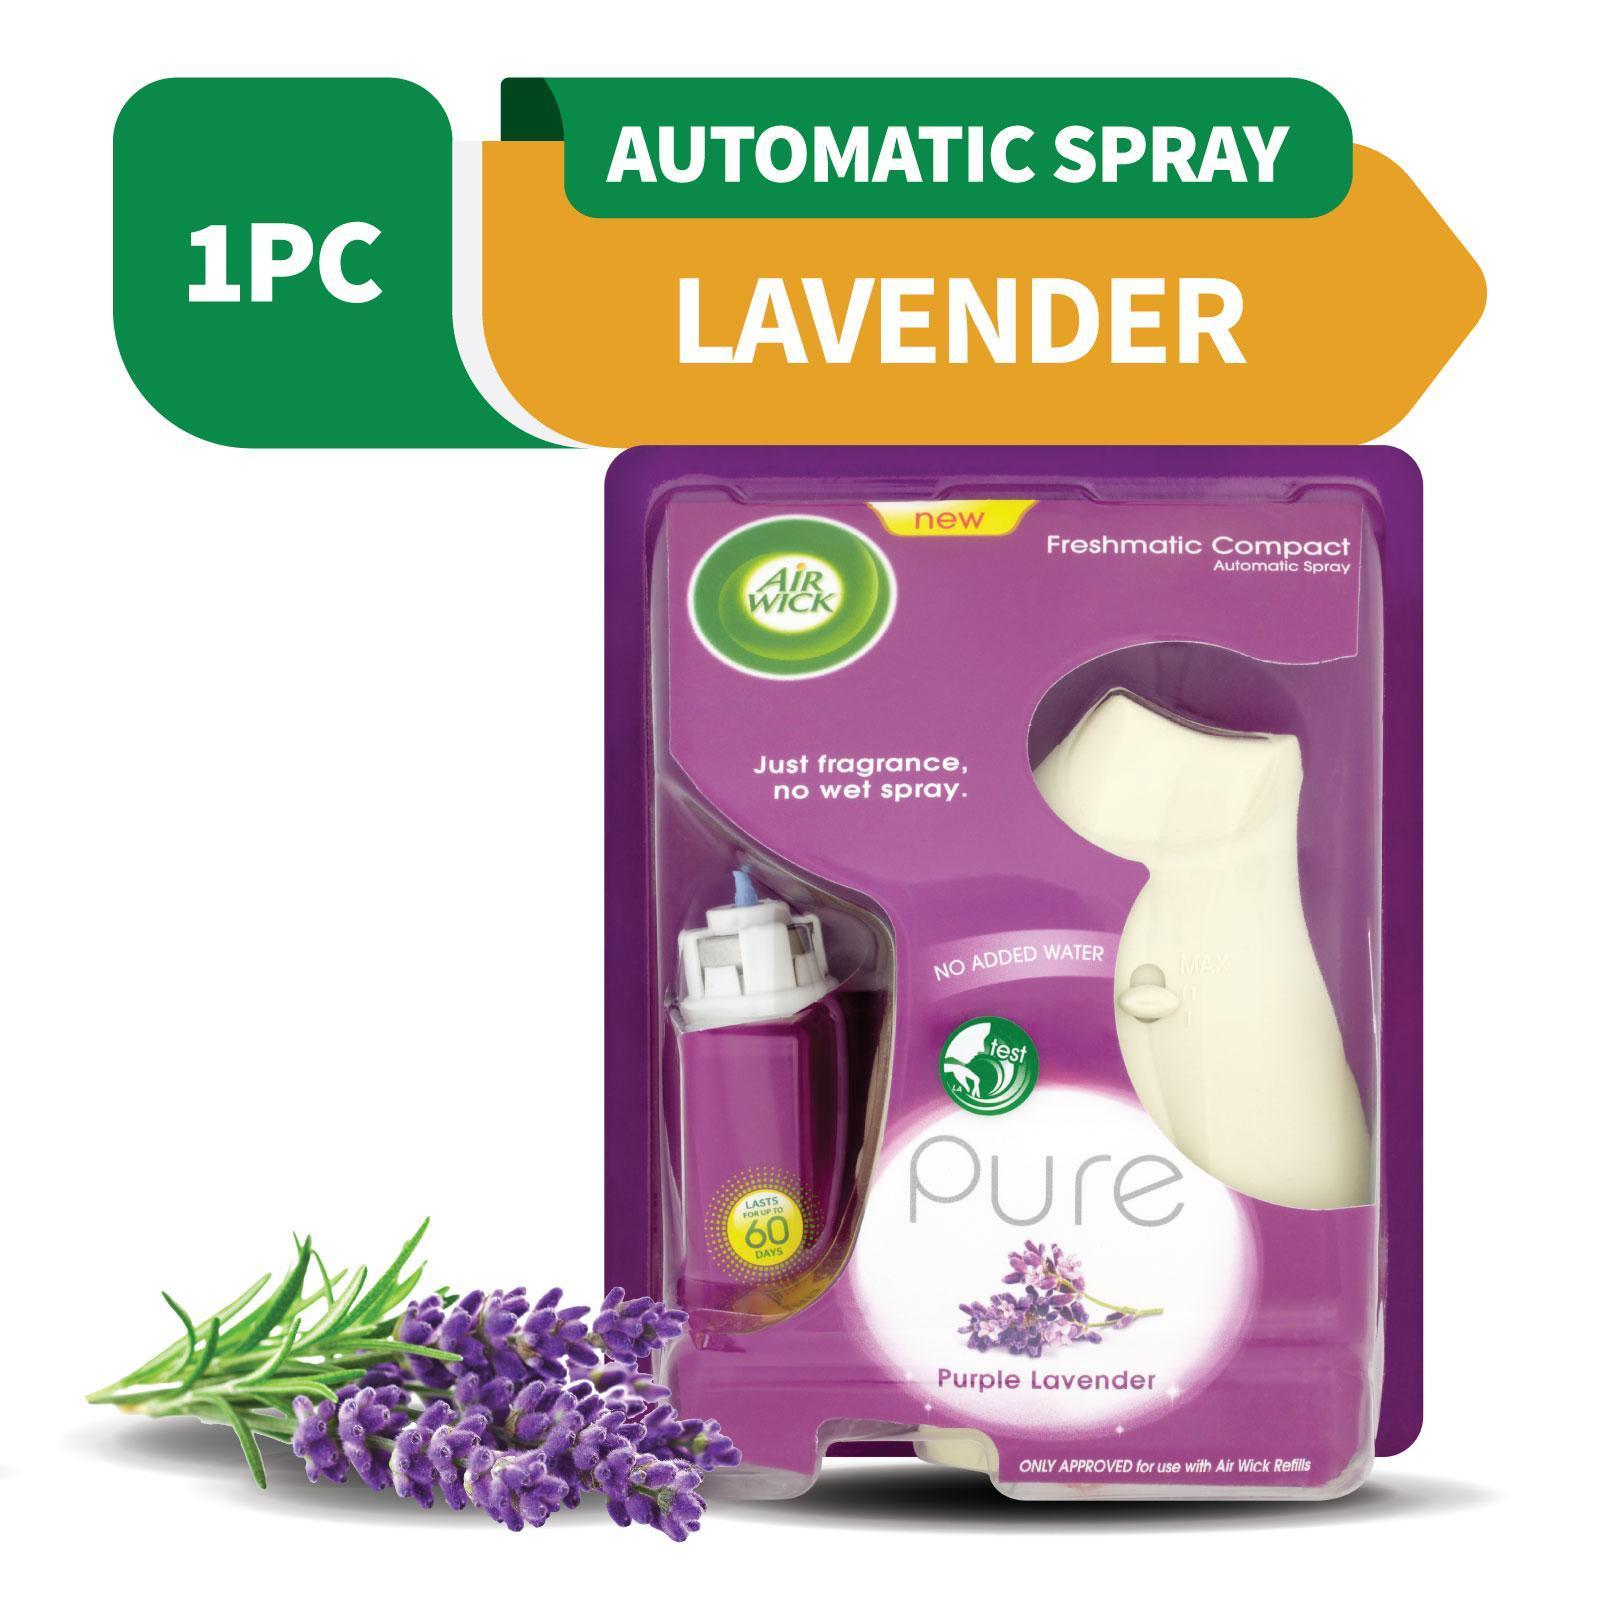 Air Wick Freshmatic Compact Automatic Spray Gadget Purple Lavender